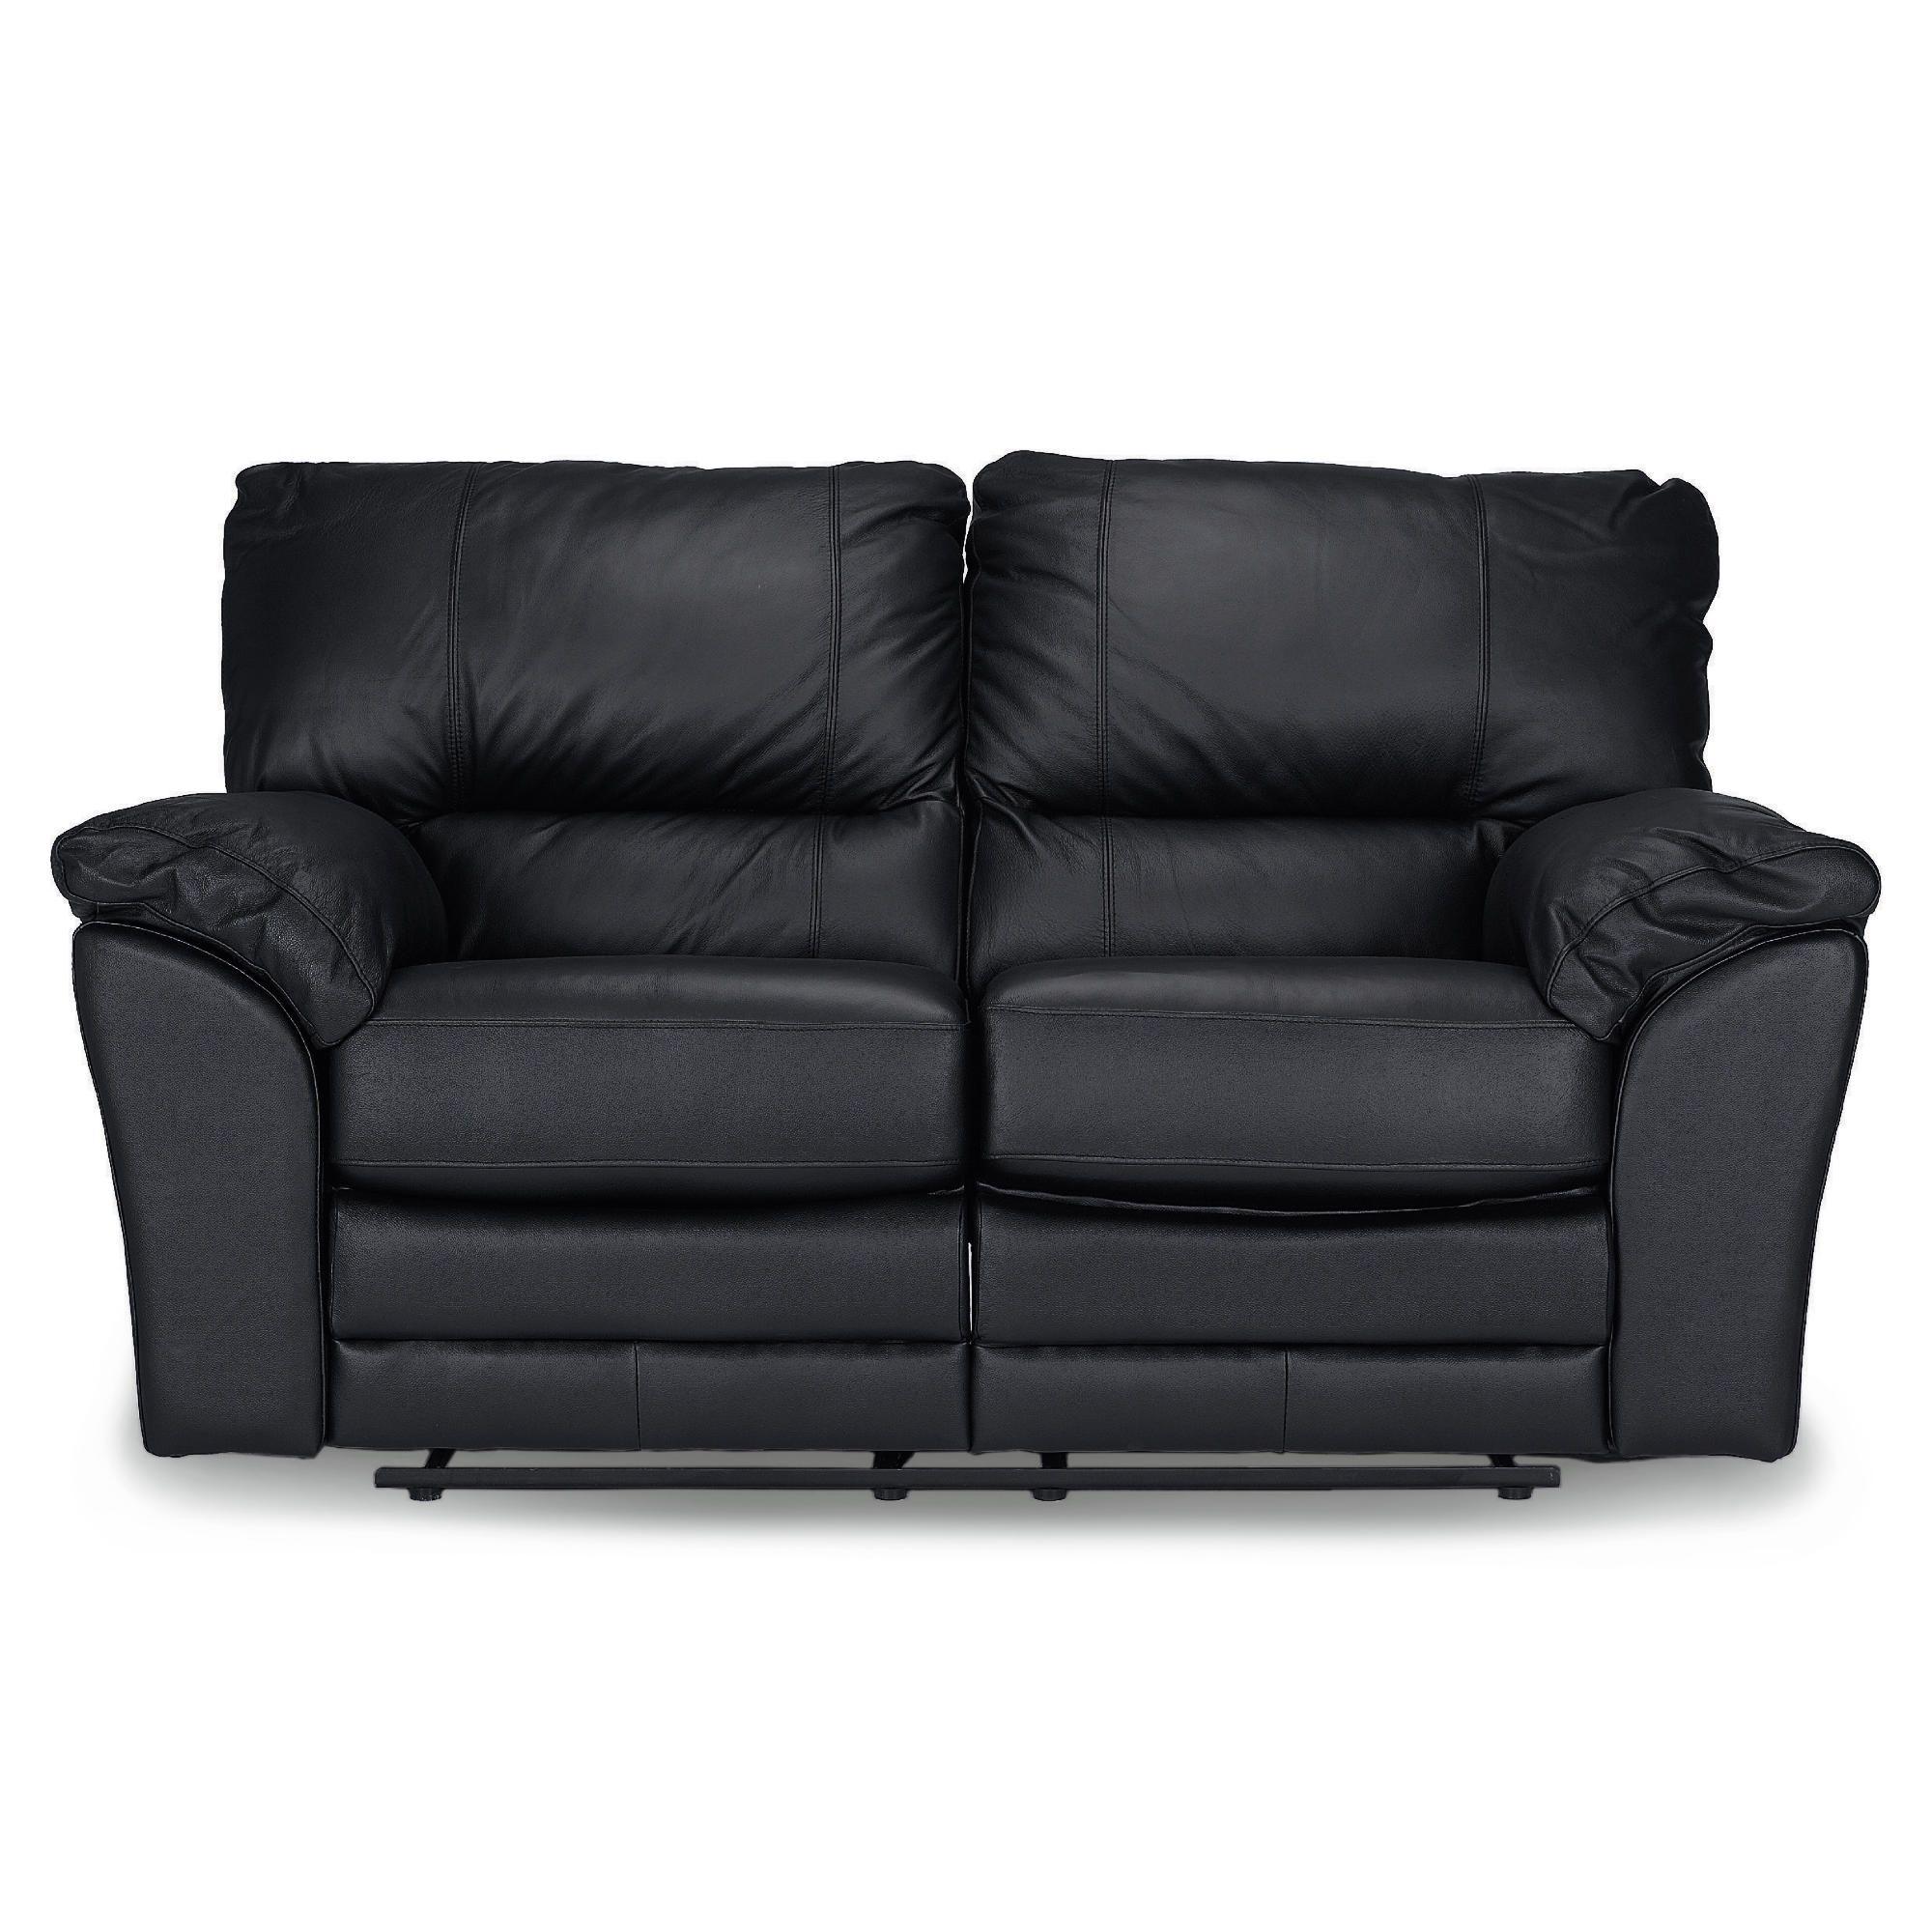 Tesco Direct Online Shopping Enjoy Big Savings Today at  : 206 4492PITPS313242wid2000amphei2000 from www.angelfire.com size 2000 x 2000 jpeg 275kB